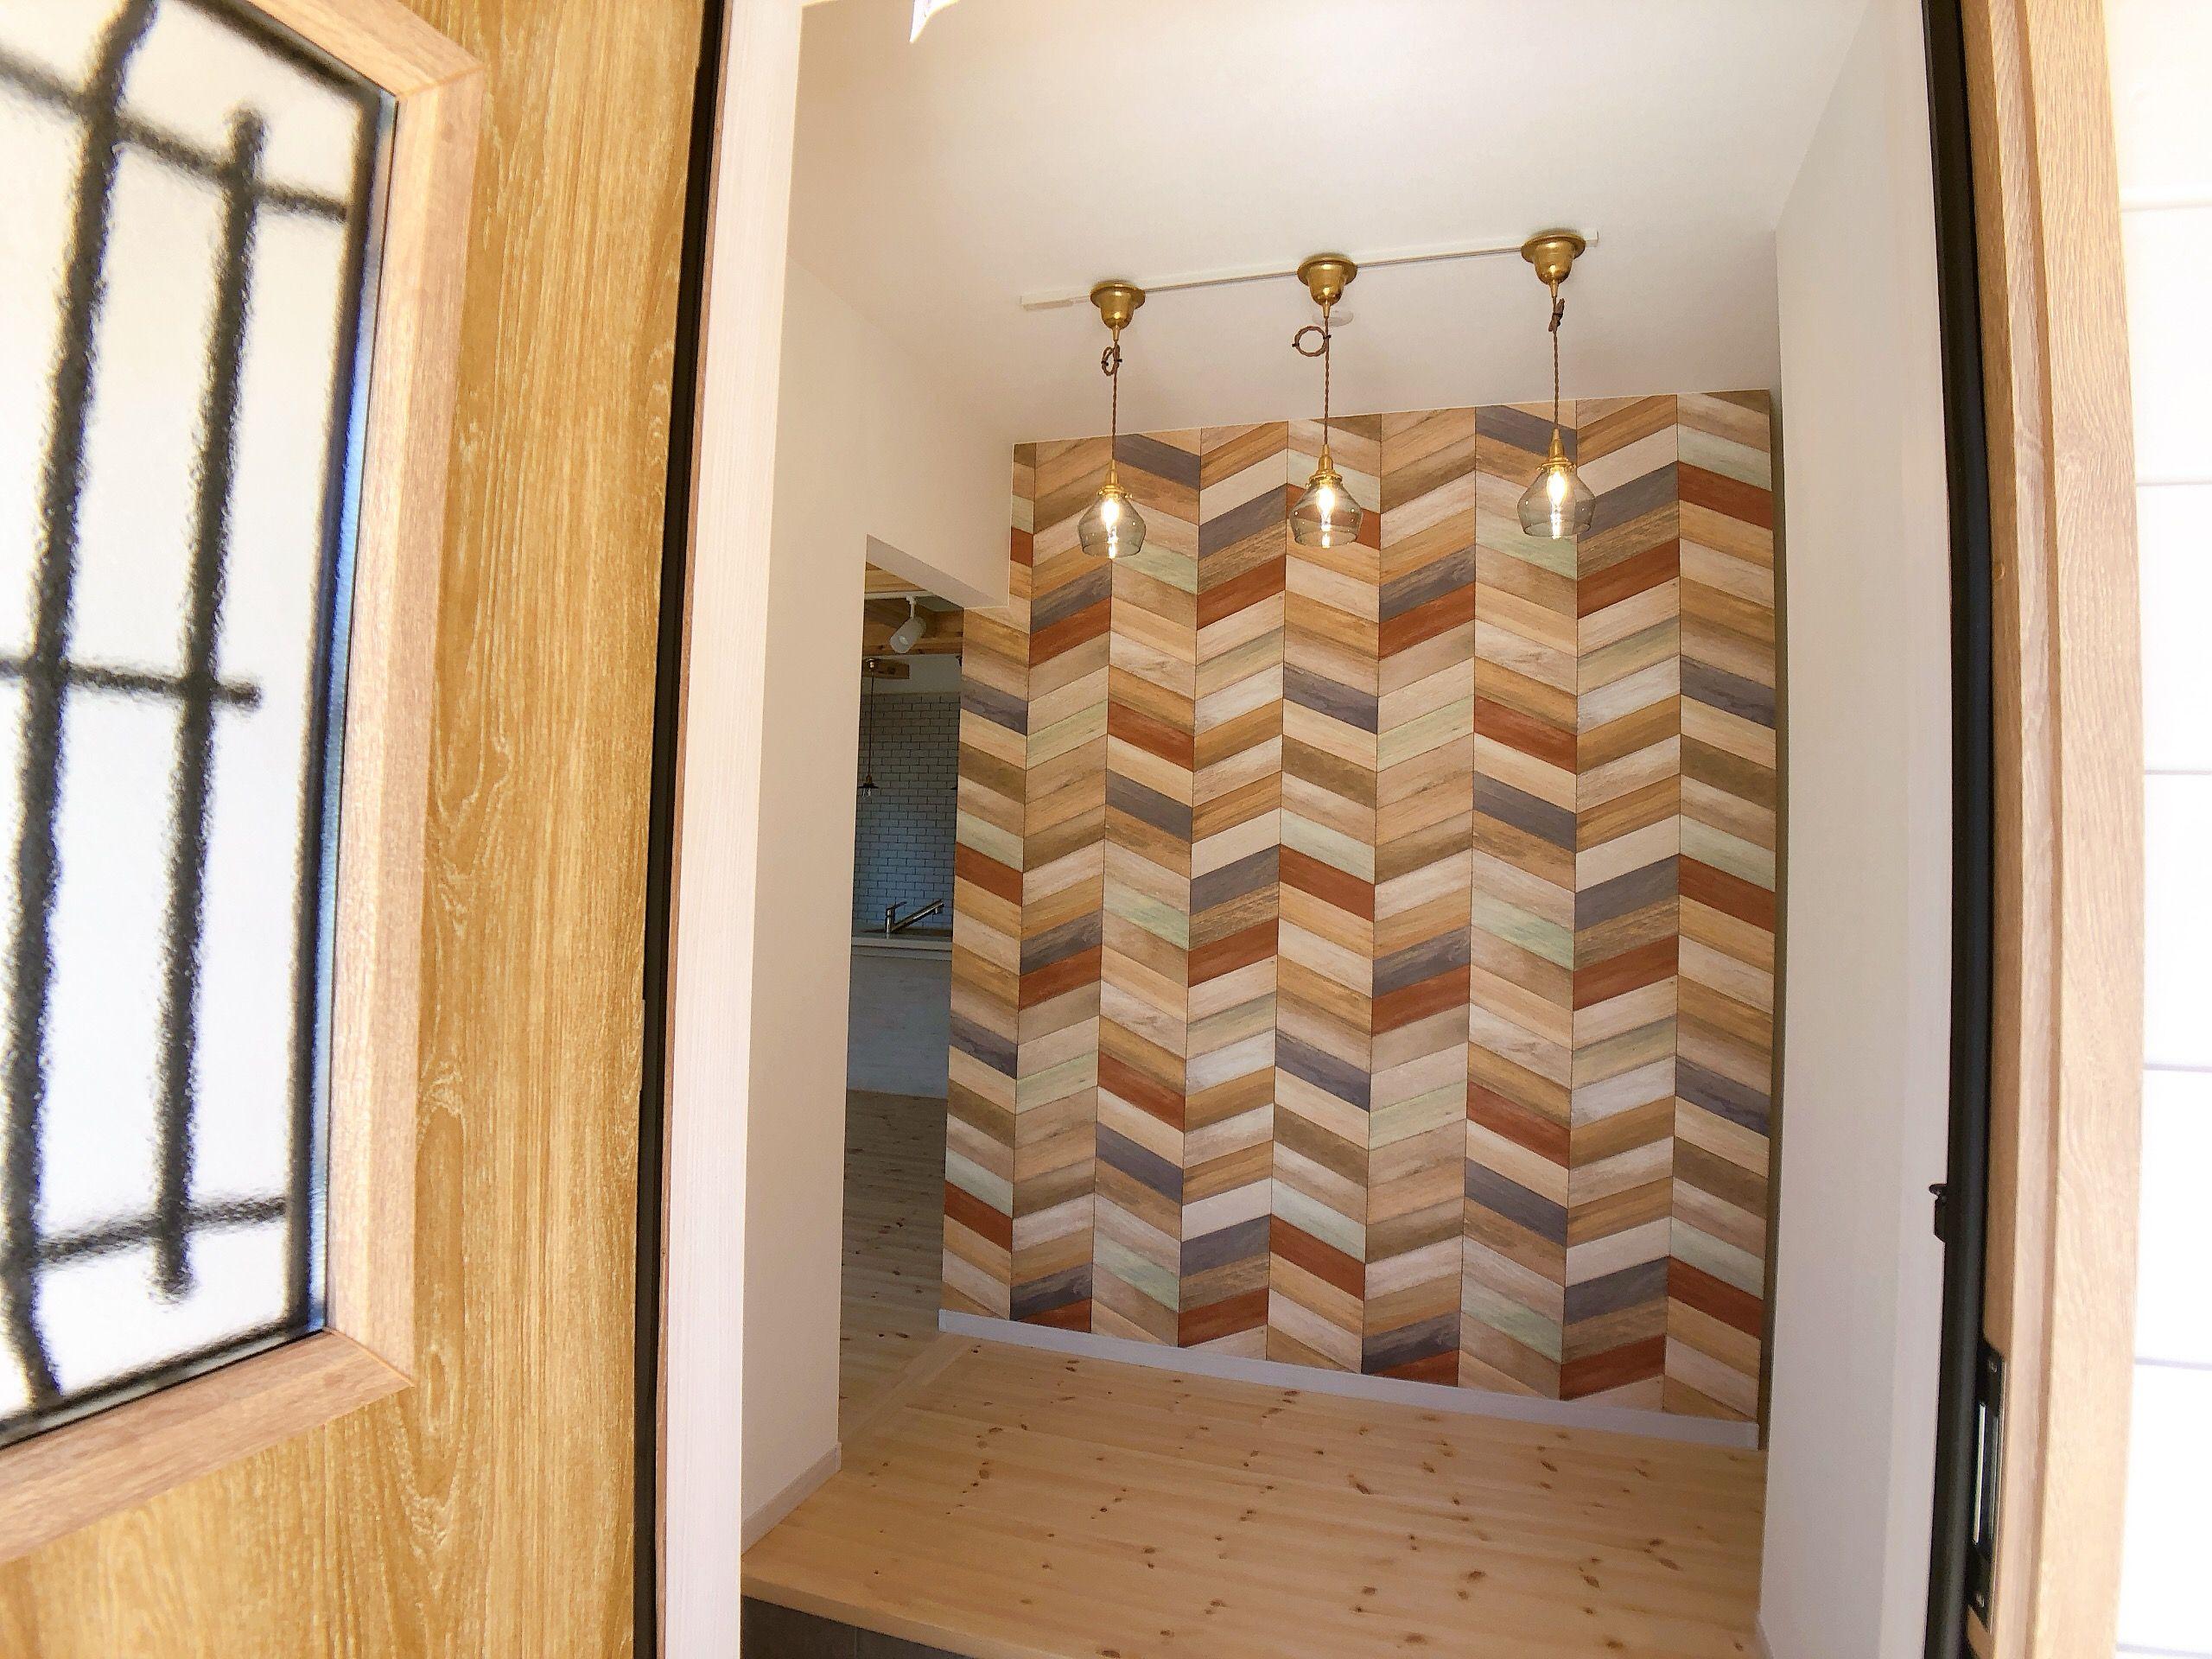 Monica1 0 諫早市 長崎で家を建てるならマイハウス カリフォルニア